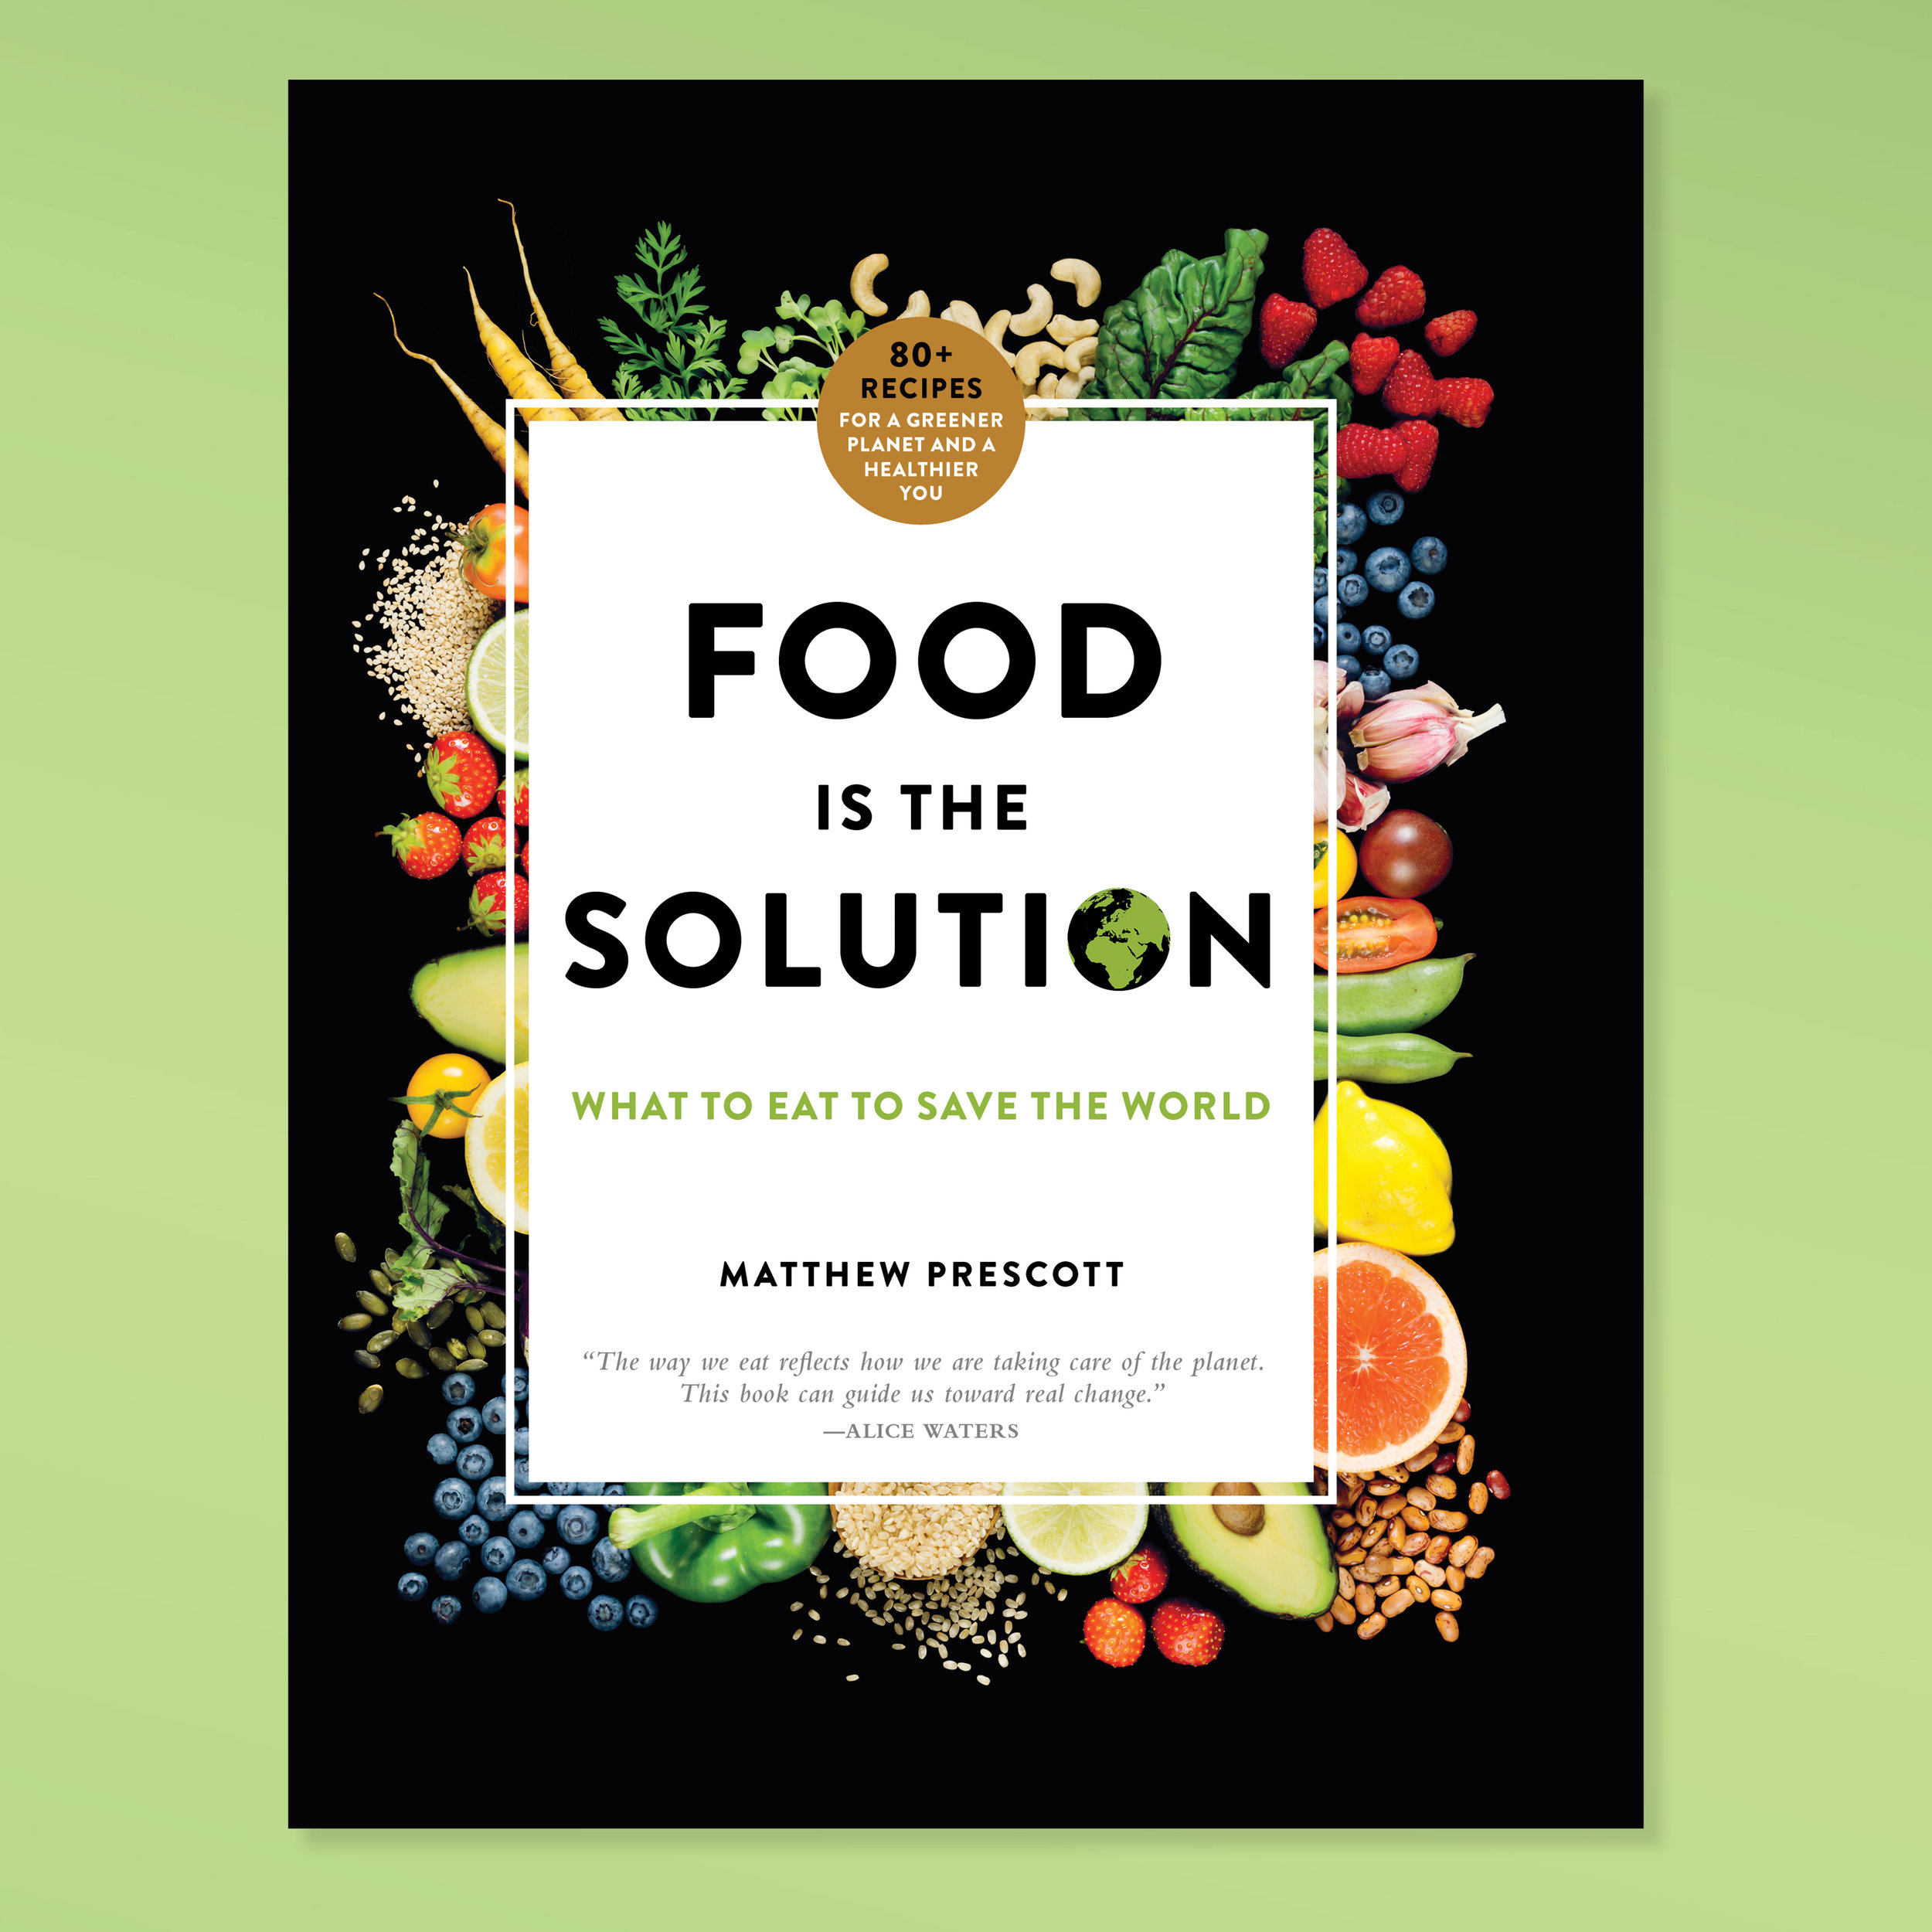 FoodIsTheSolution_For WebsiteSquare.jpg